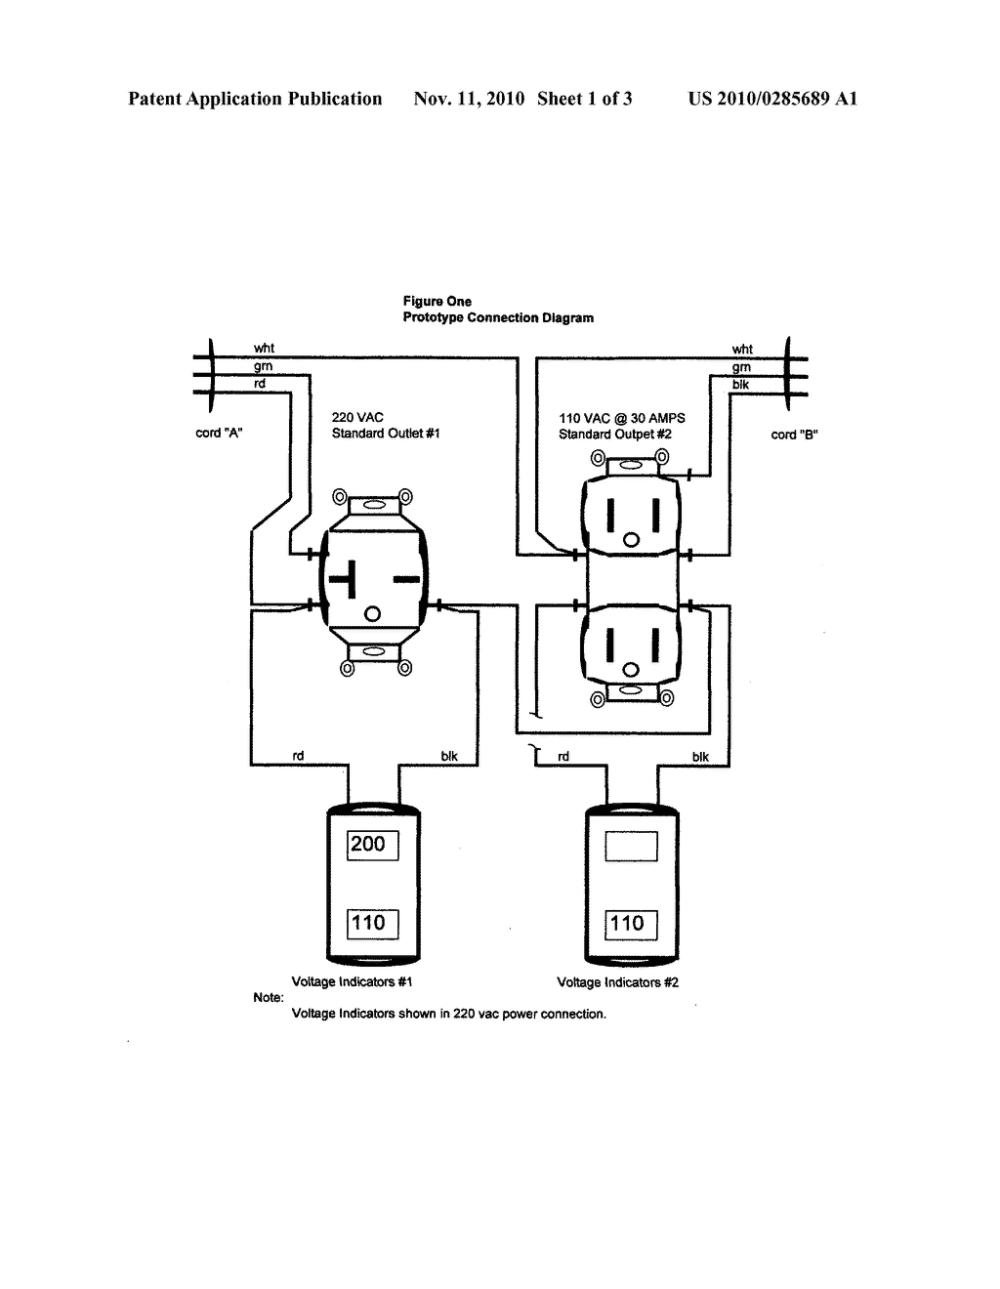 medium resolution of 110 volt plug wiring diagram wiring library110 to 220 volt wiring diagram schema wiring diagram online